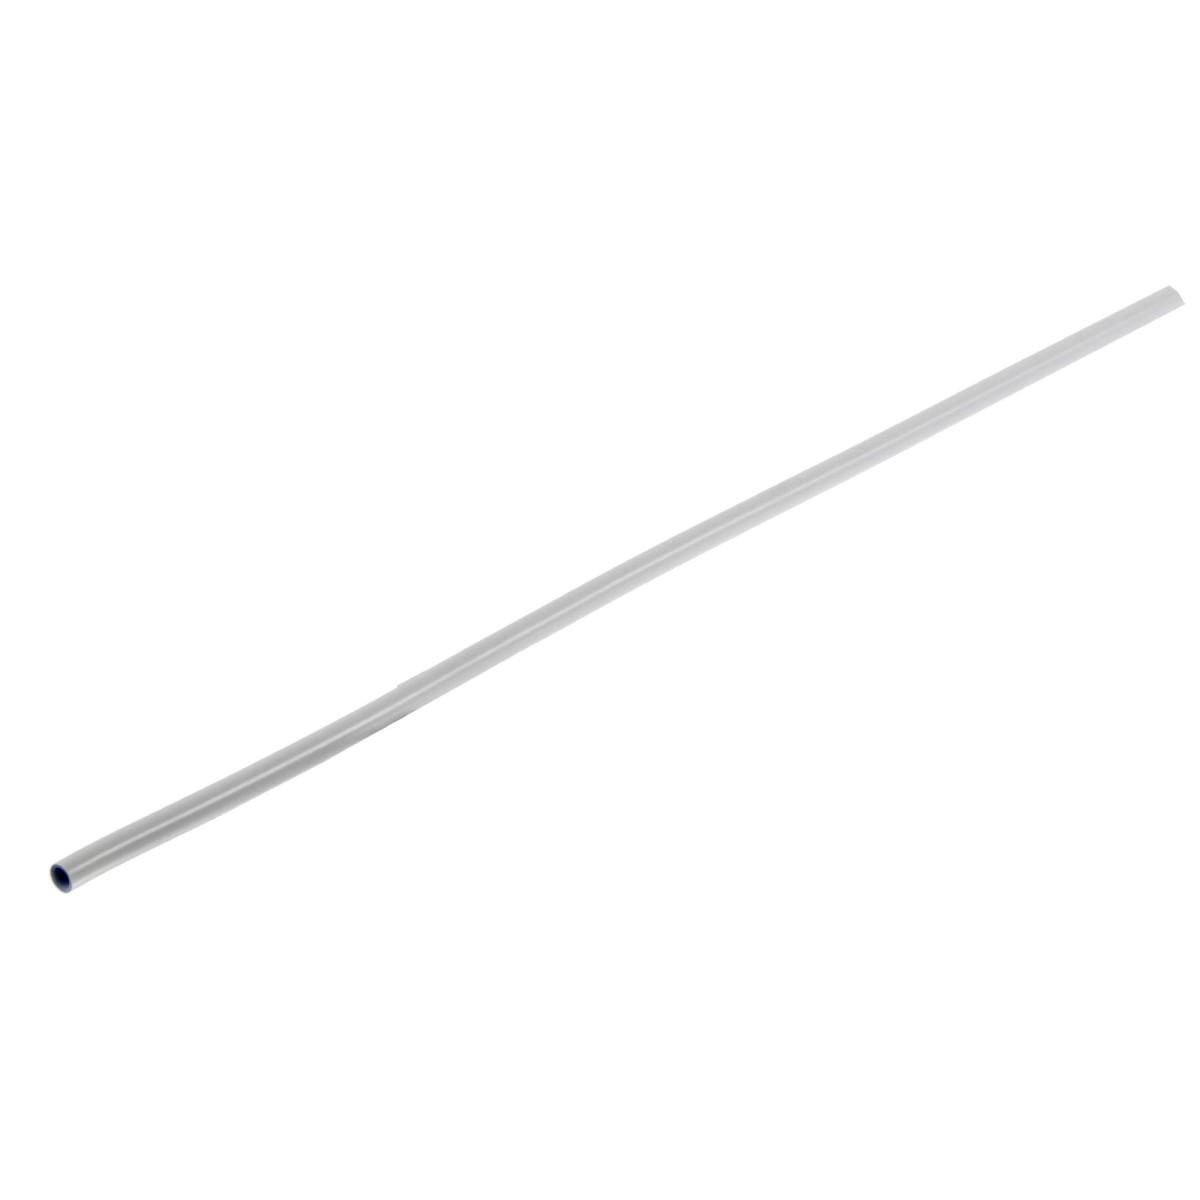 Труба ПСМ d 16 мм металлопластик на отрез